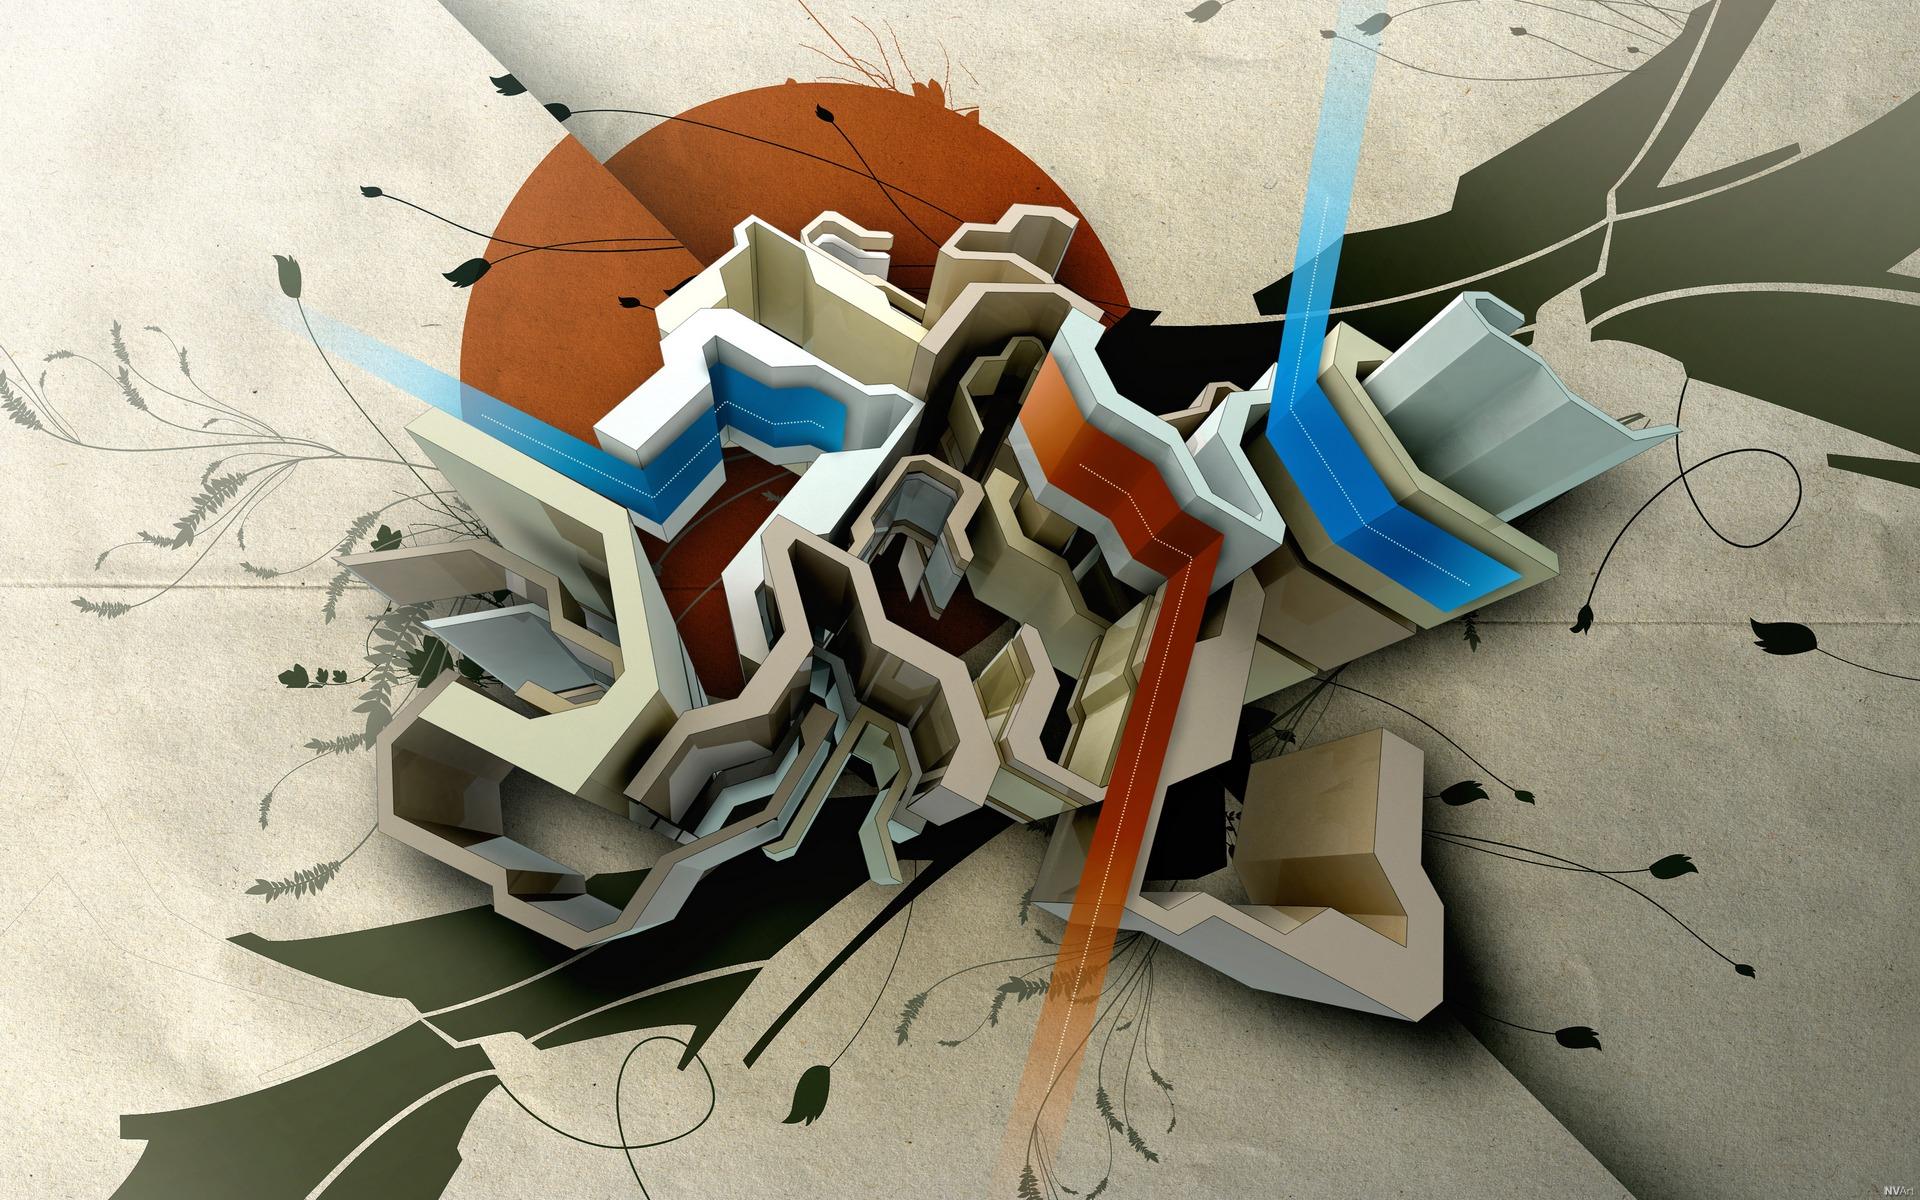 General 1920x1200 abstract digital art artwork shapes lines